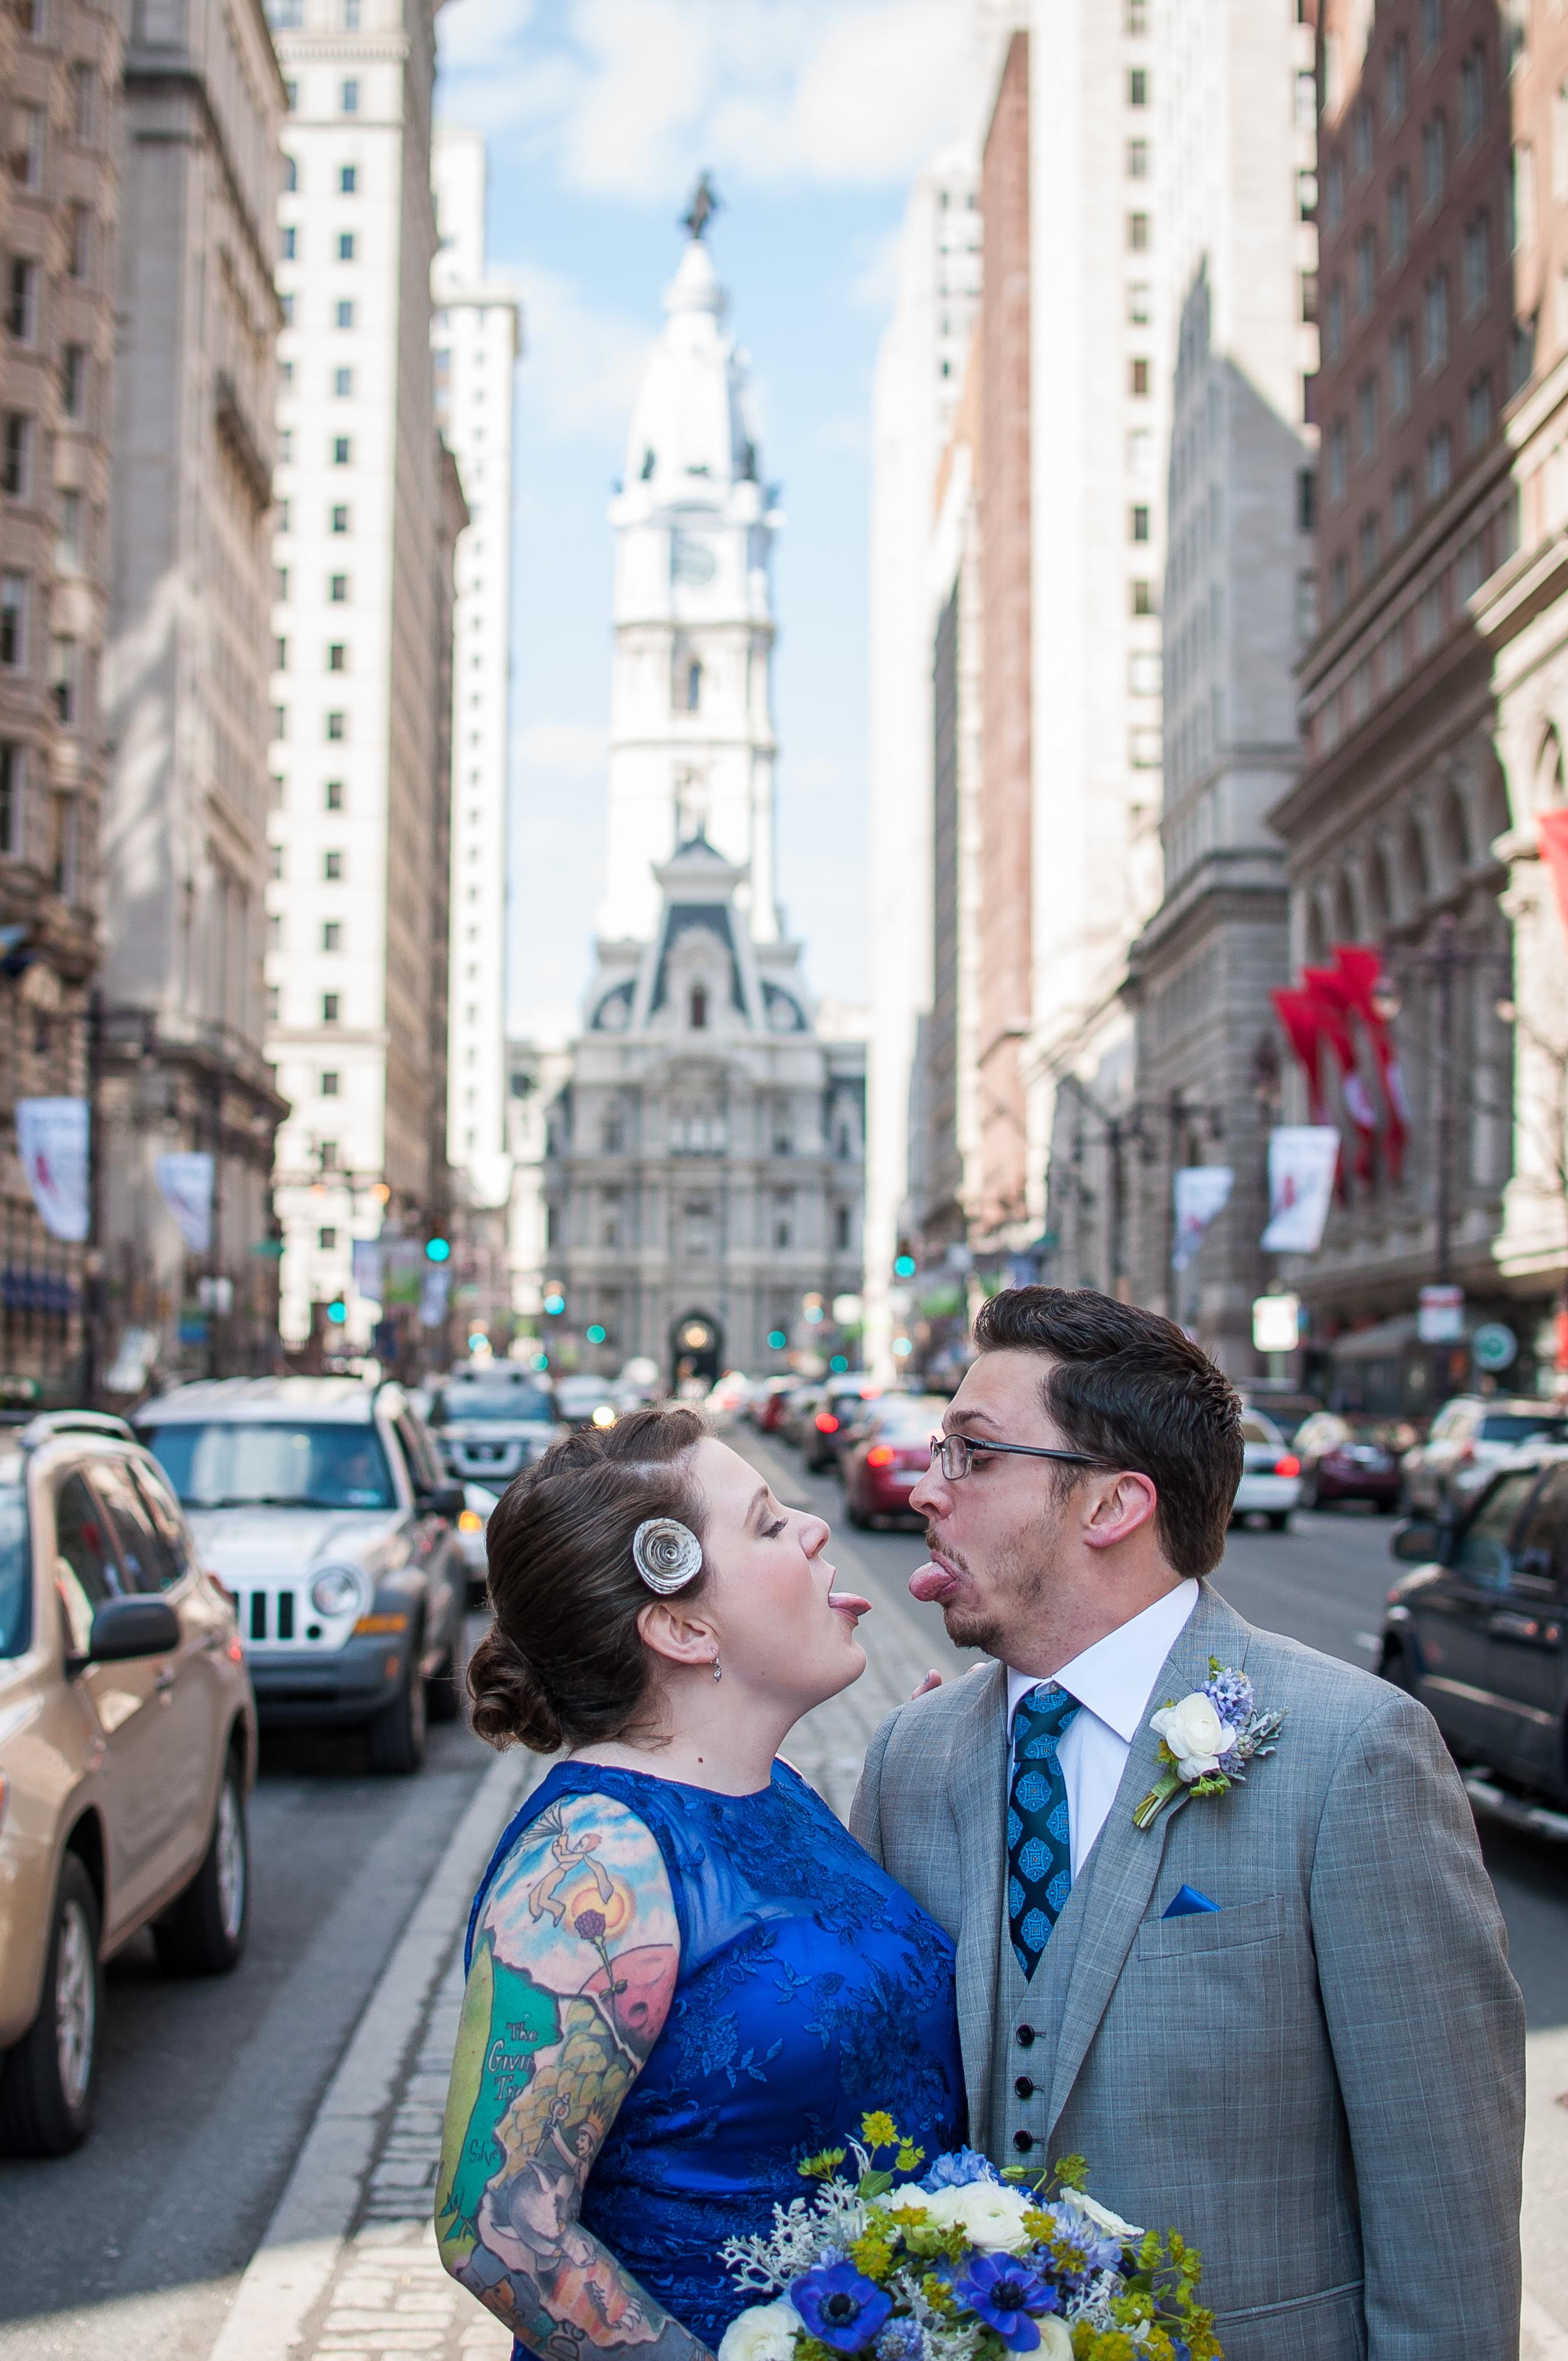 140405 - Heather and Matt's Wedding-14.jpg